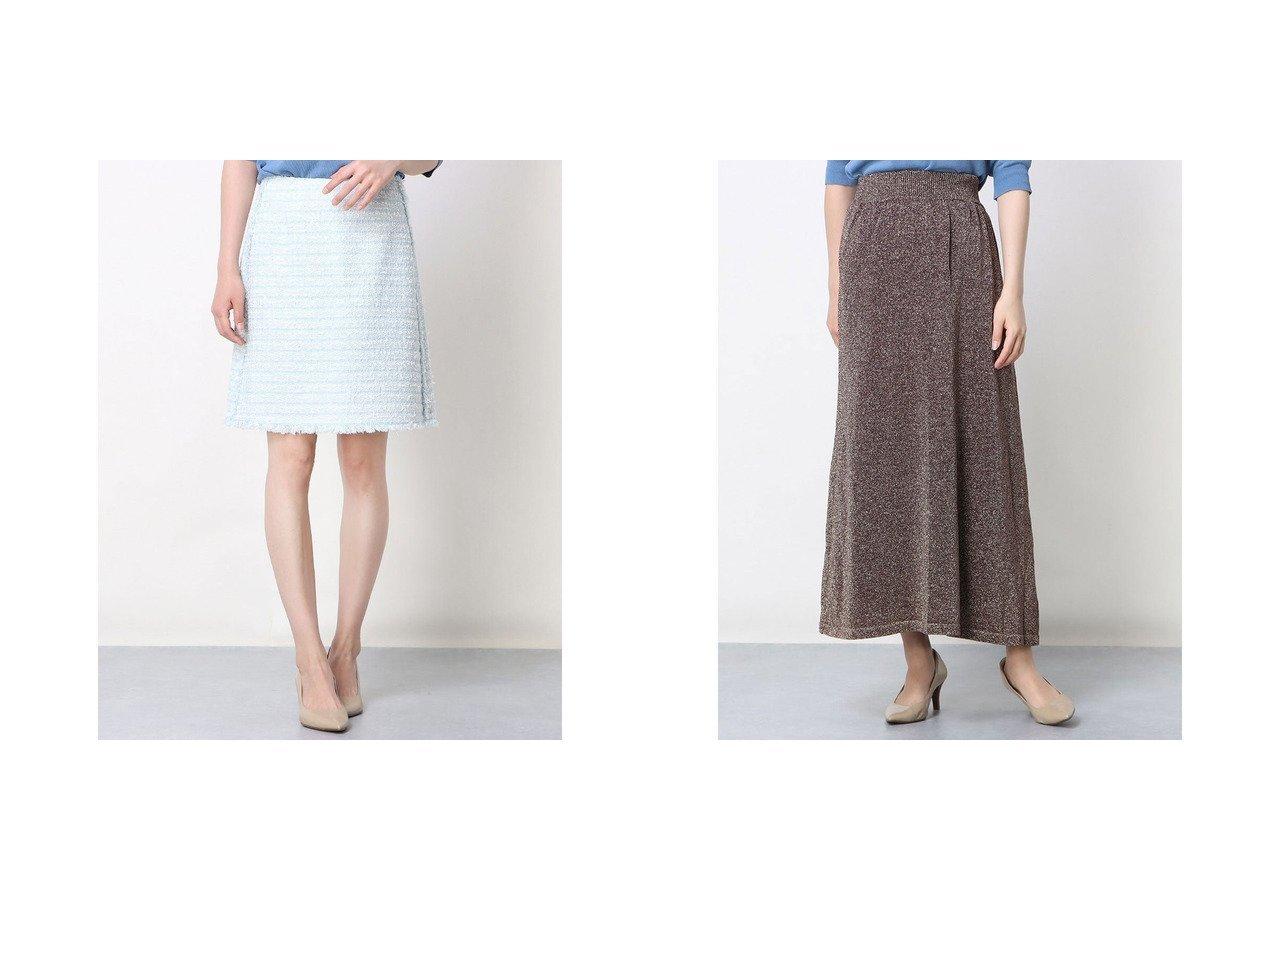 【Rename/リネーム】のツイード調台形スカート&ラメニットギャザースカート おすすめ!人気、トレンド・レディースファッションの通販 おすすめで人気の流行・トレンド、ファッションの通販商品 インテリア・家具・メンズファッション・キッズファッション・レディースファッション・服の通販 founy(ファニー) https://founy.com/ ファッション Fashion レディースファッション WOMEN スカート Skirt 台形スカート Trapezoid Skirt ツイード 台形 2021年 2021 2021春夏・S/S SS/Spring/Summer/2021 S/S・春夏 SS・Spring/Summer 春 Spring |ID:crp329100000045824